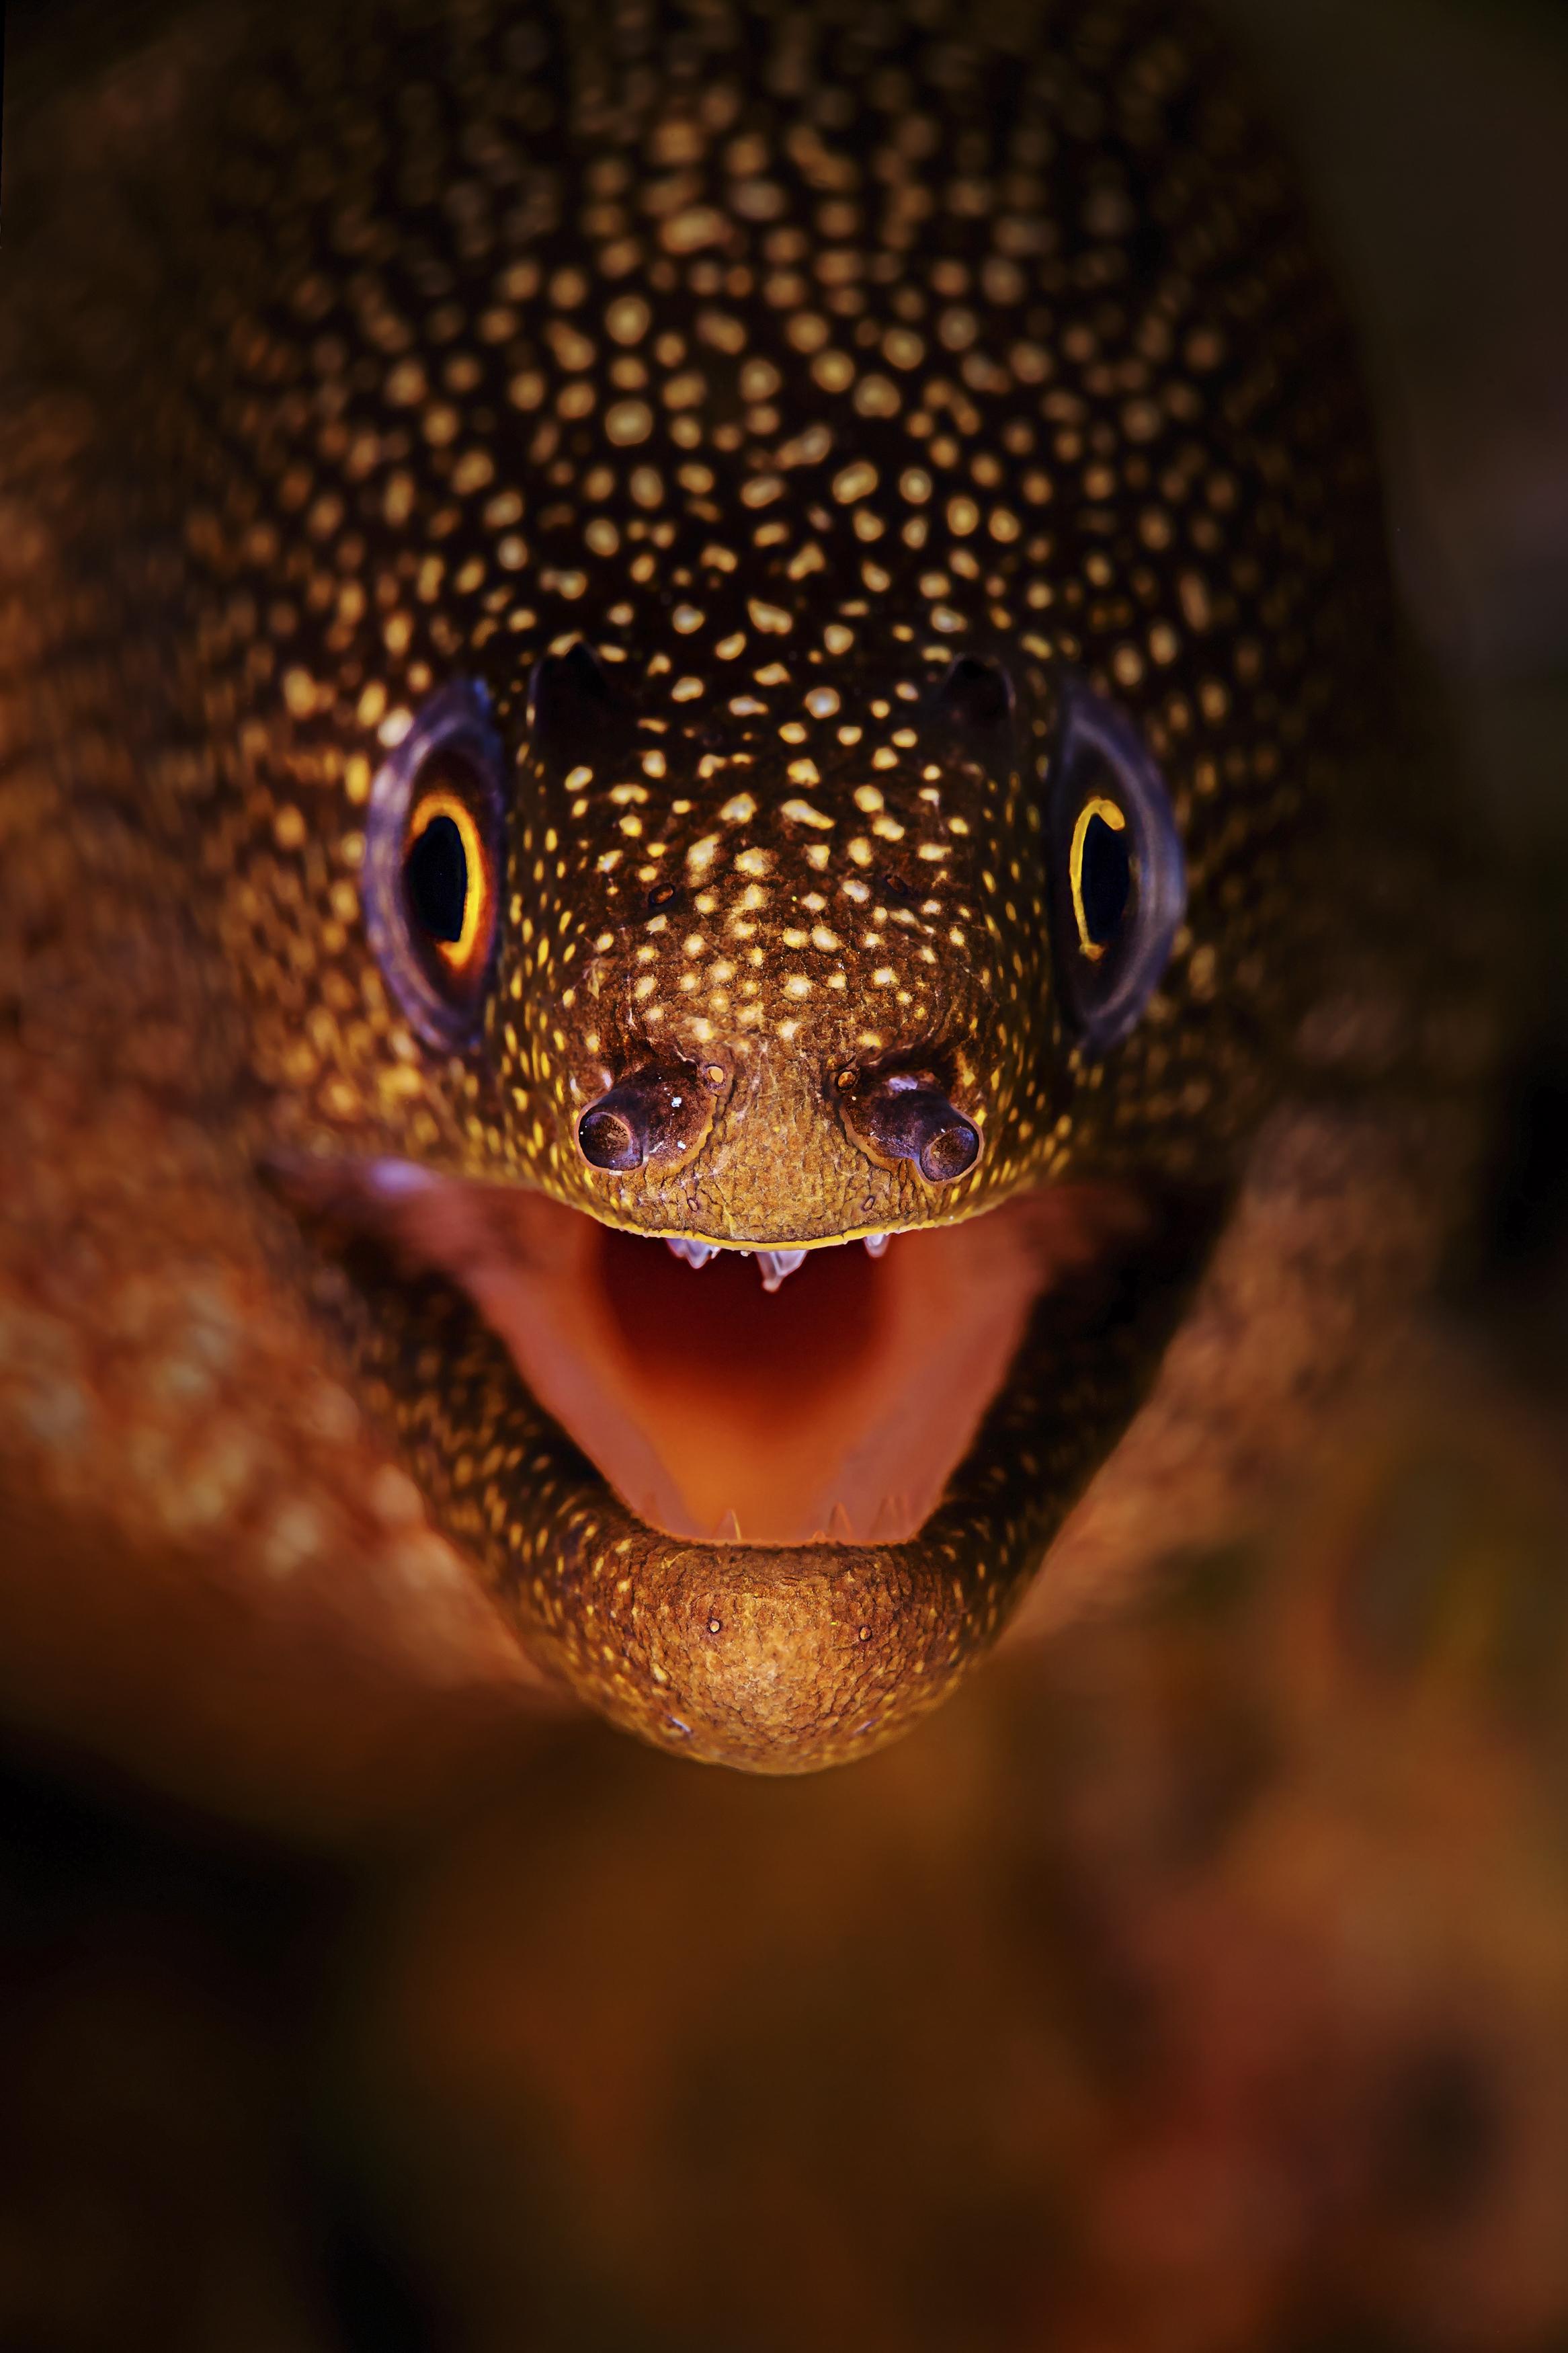 moray eel credit: beth watson / coral reef image bank